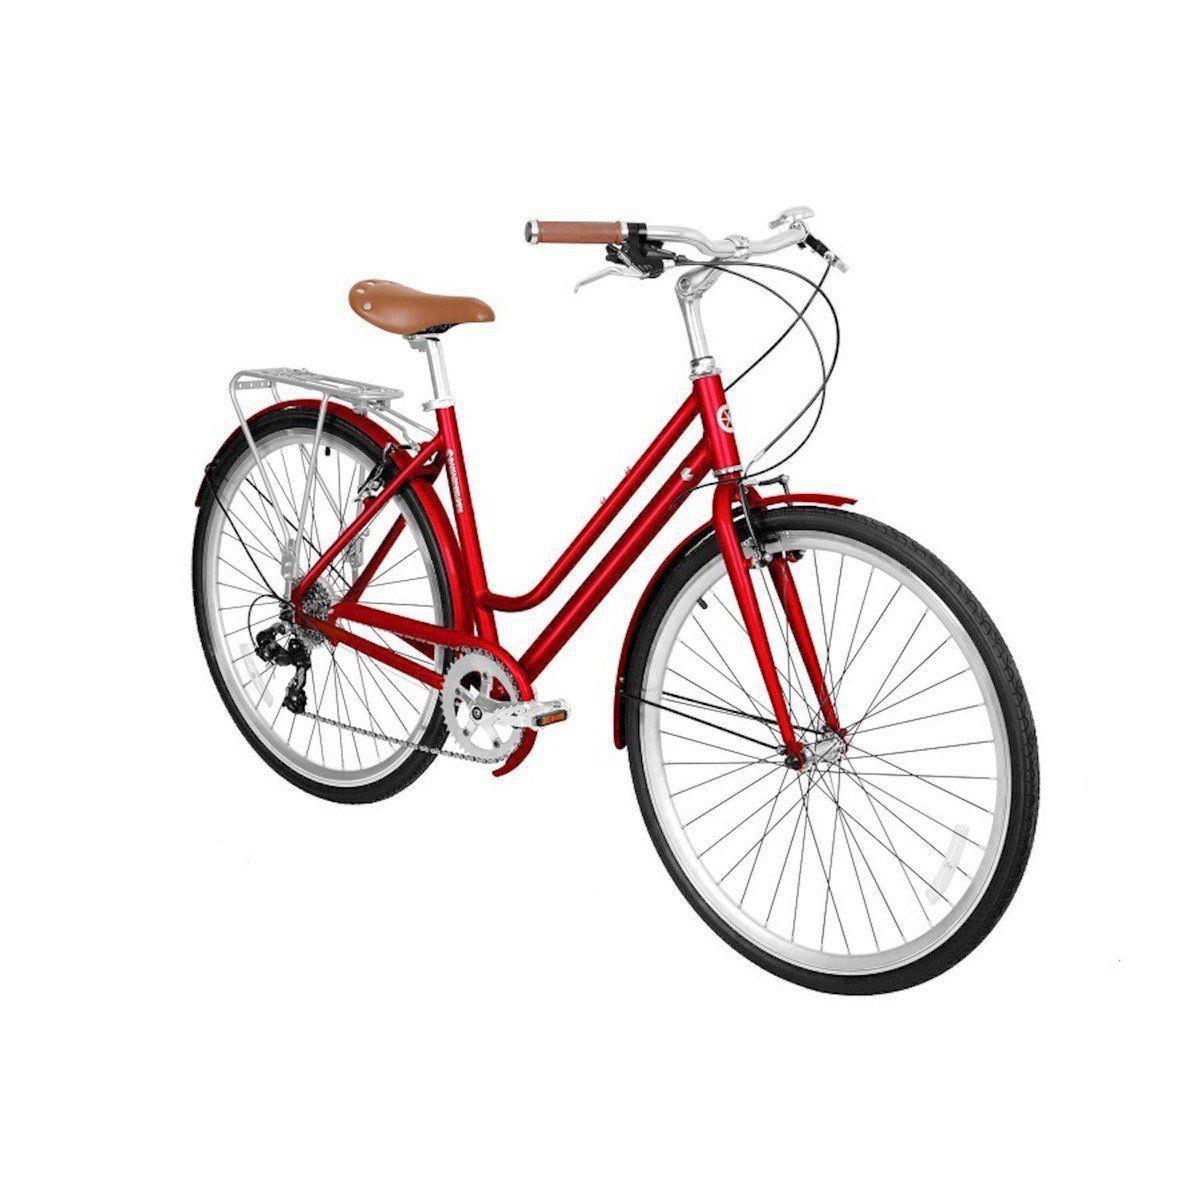 b1a1630c9 Bicicleta feminina gama metropole aro 700 mettalic cherry - Gama bikes R$  1.599,00 à vista. Adicionar à sacola